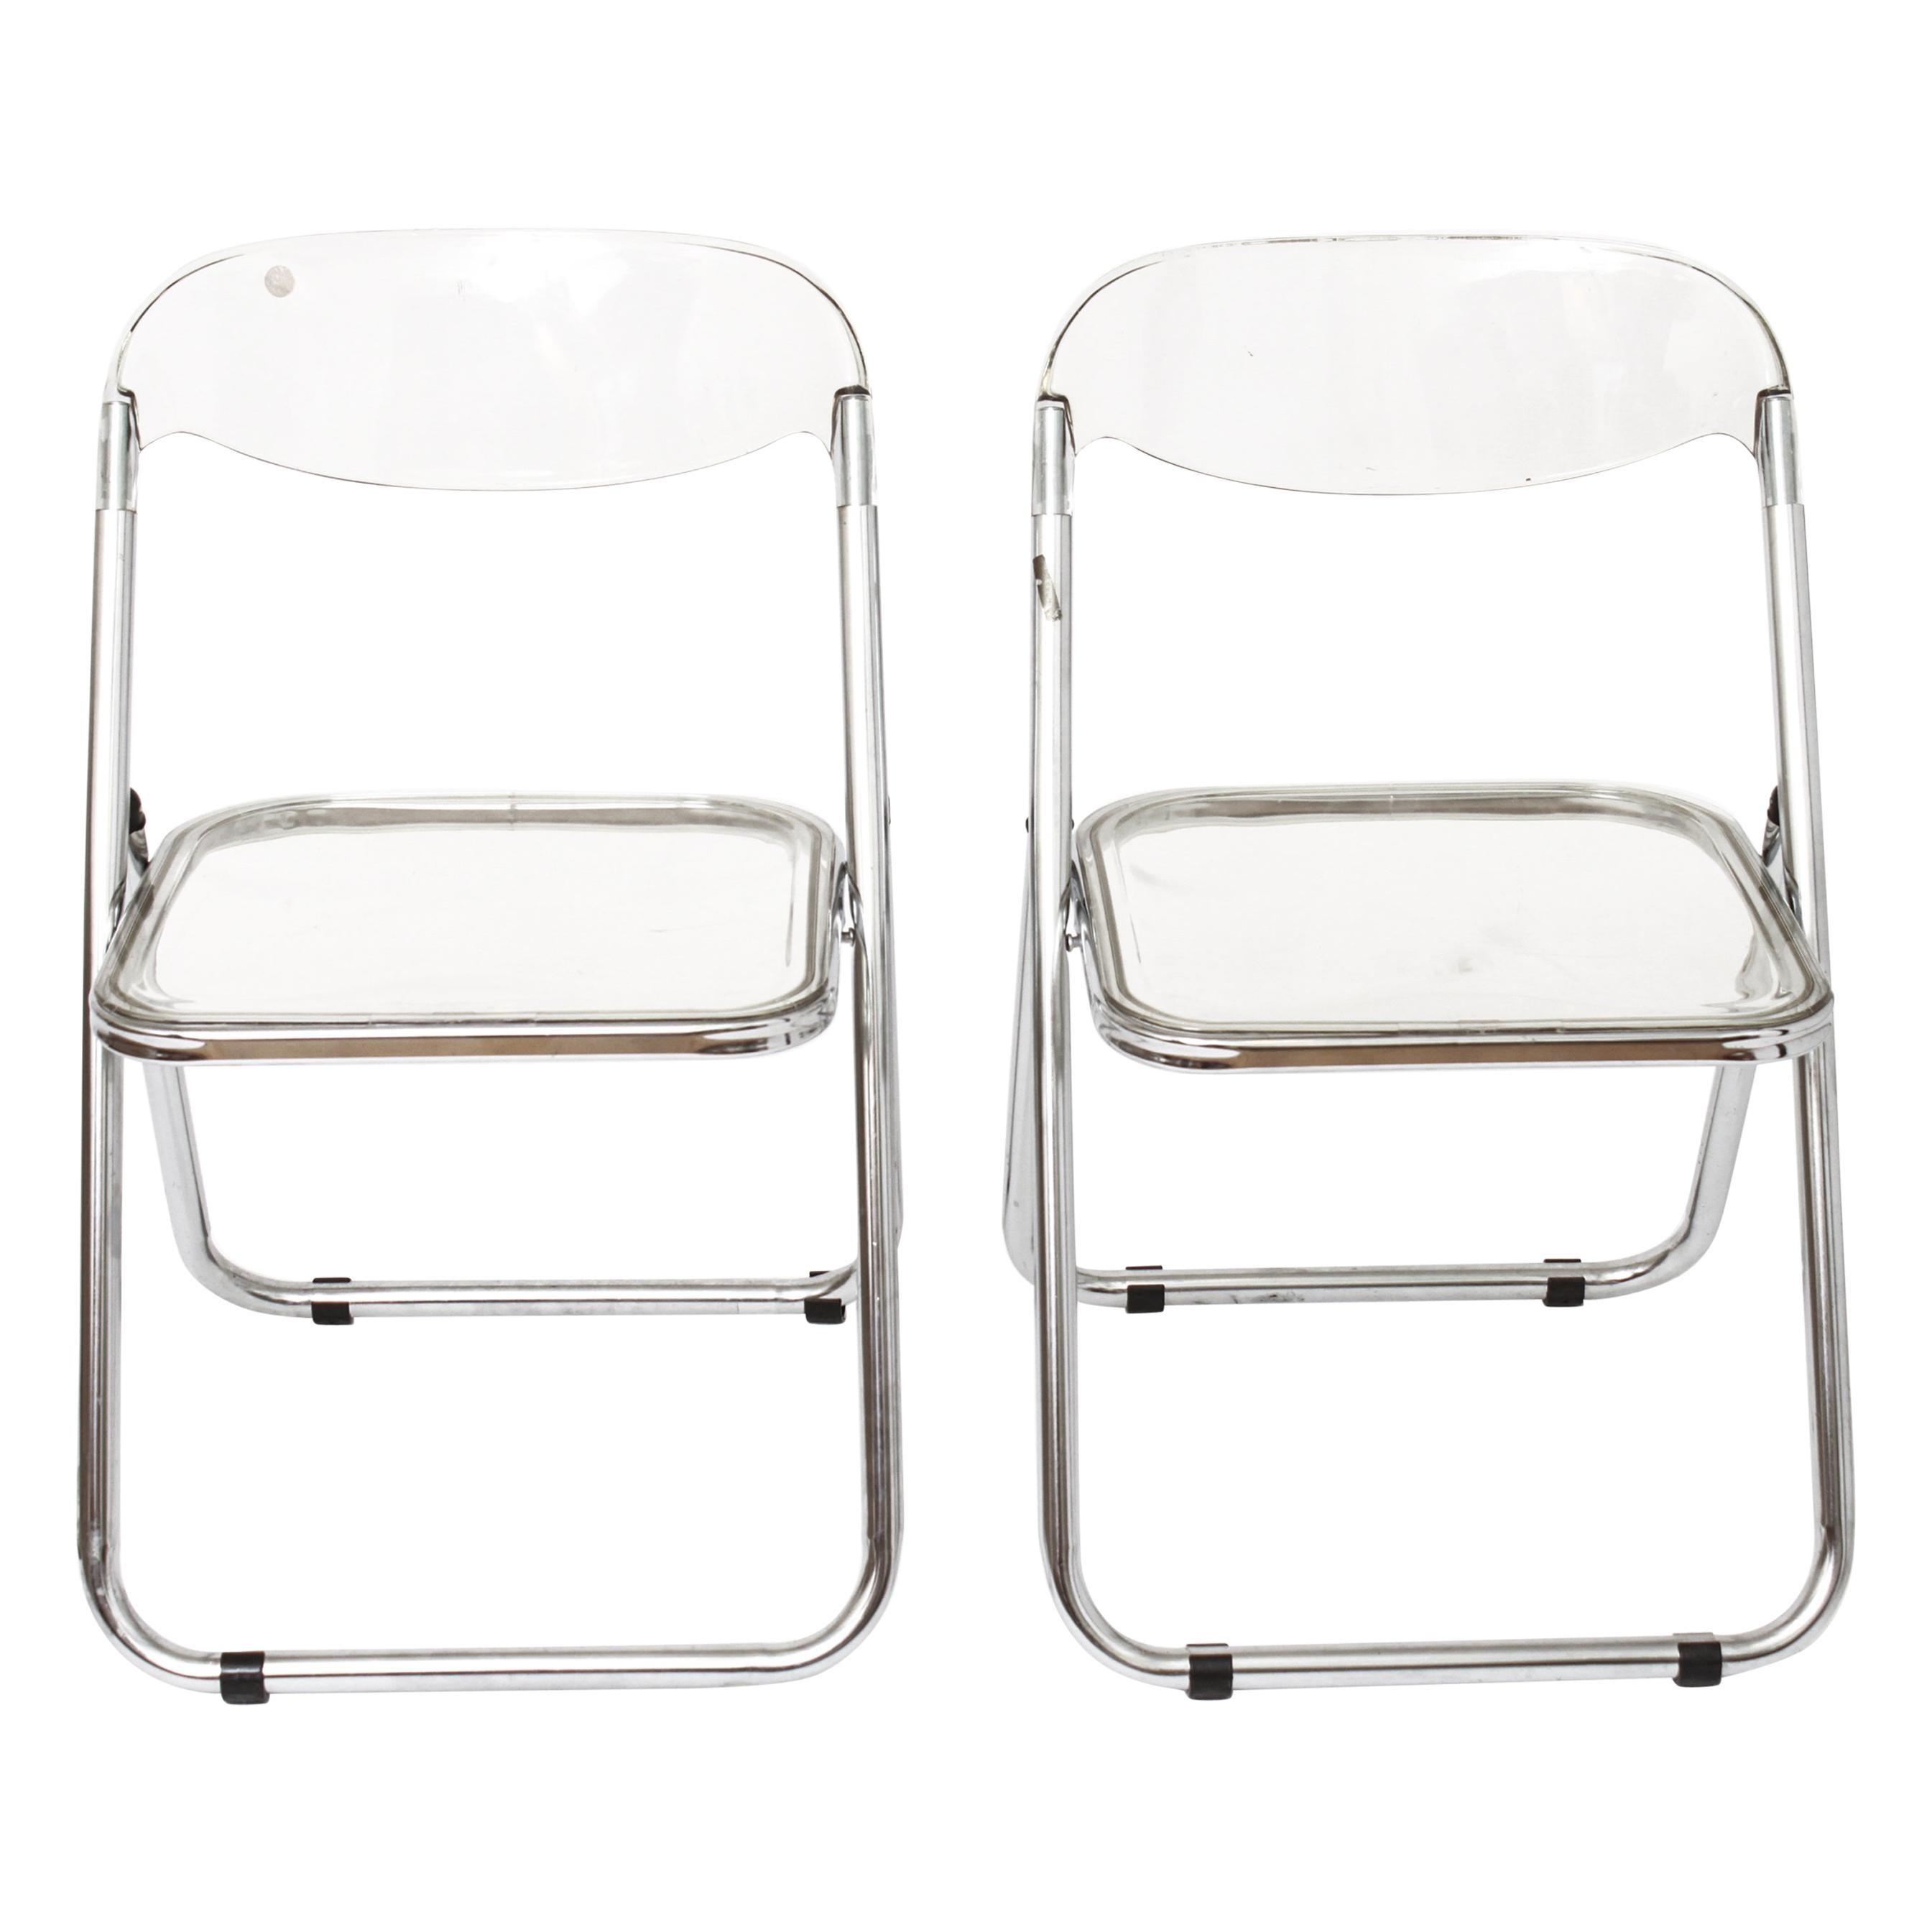 Giancarlo Piretti for Castelli Modern 'Plia' Acrylic Chairs